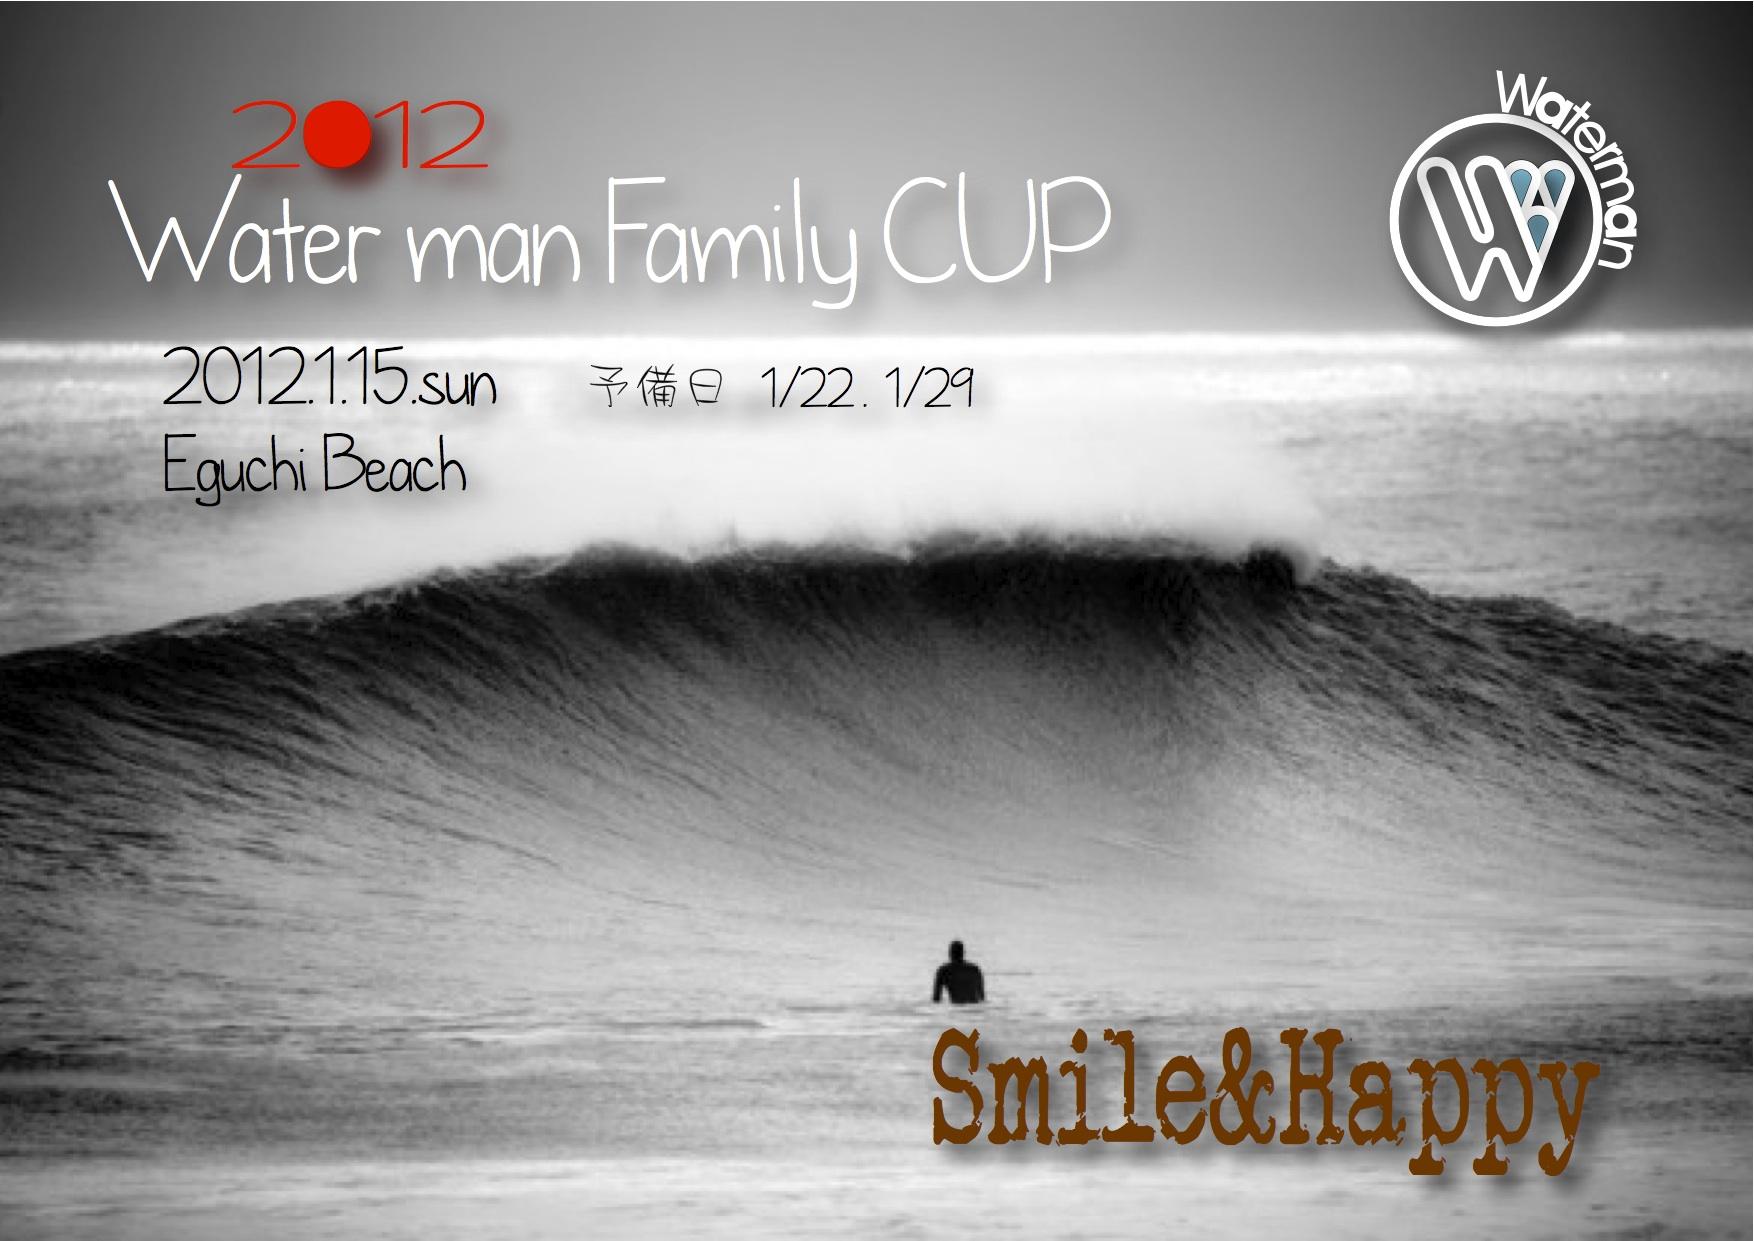 2012Water man ファミリーカップ!_f0040206_12505548.jpg